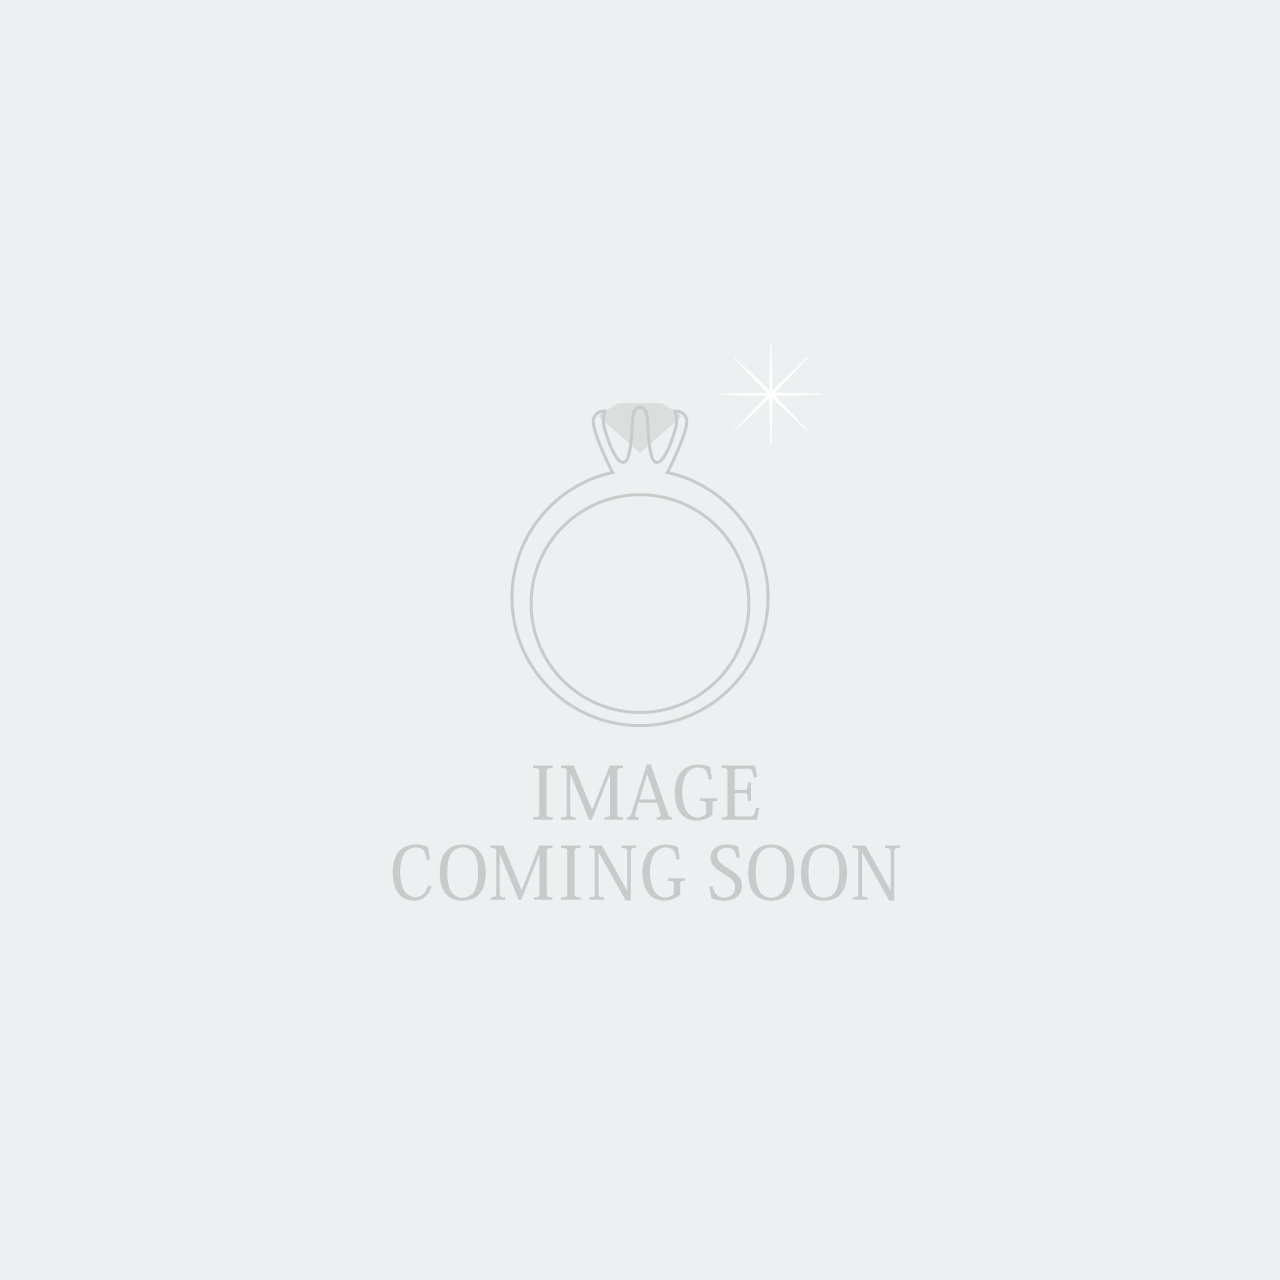 UV硬化樹脂 / 3Dモデル (リング) / 結び -七宝繋ぎリング-